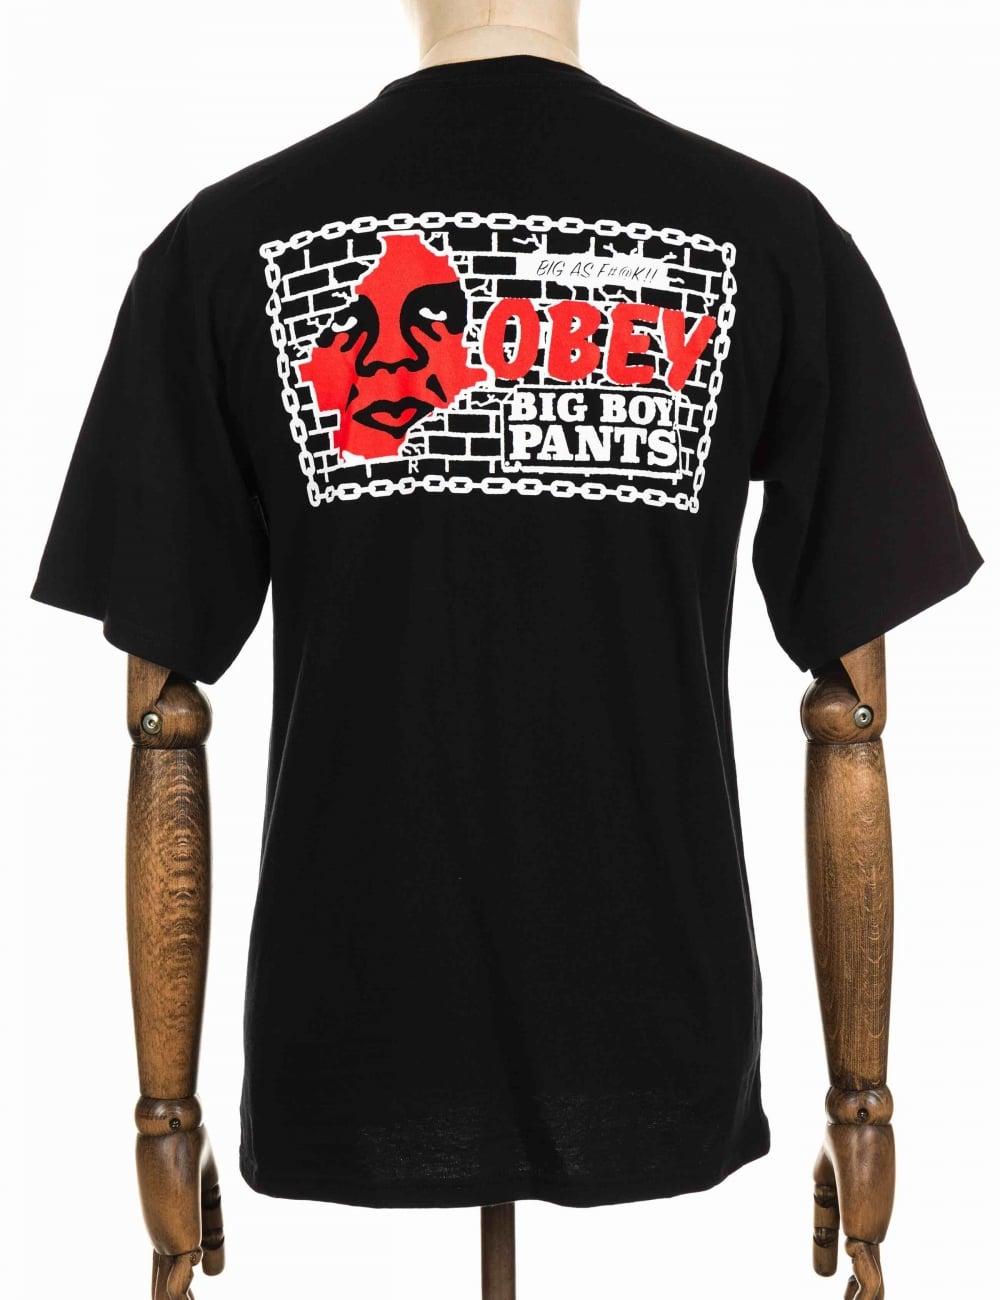 Obey Clothing Boy Pants T Shirt